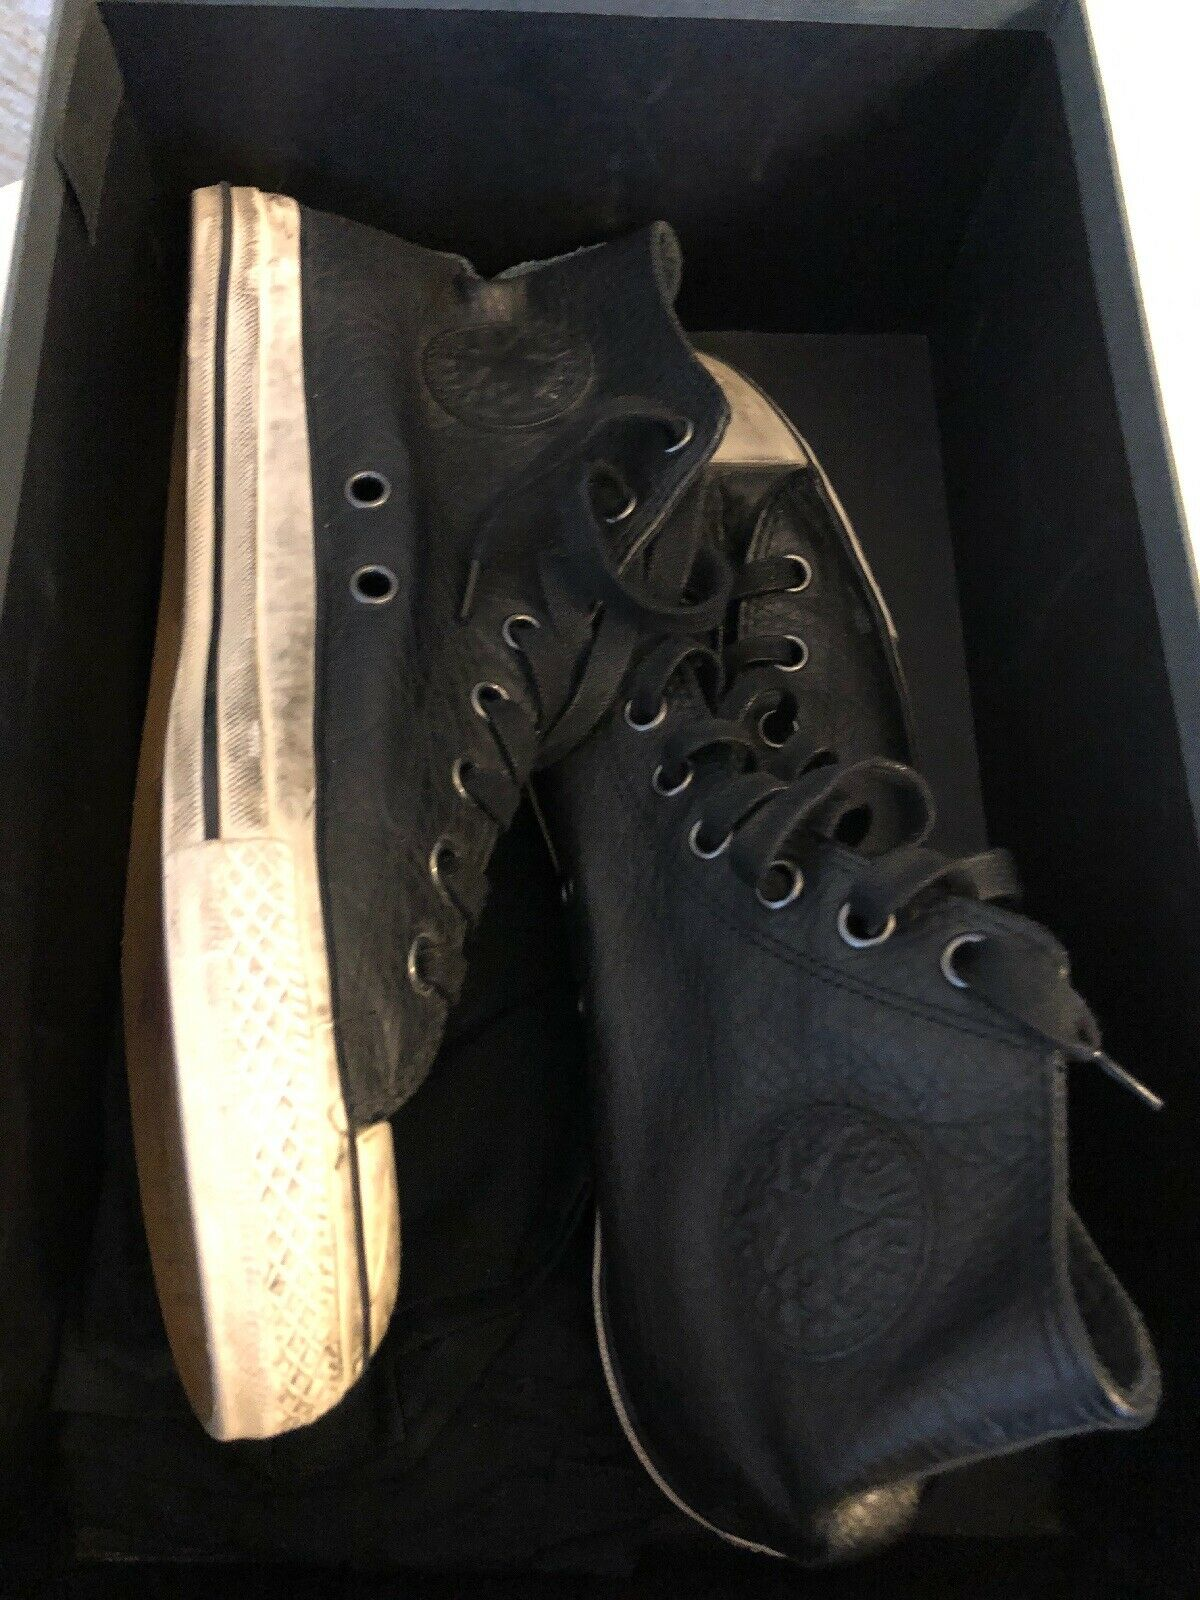 John varvatos converse 10.5 Leather Allstar nero Hightop Mint CTAS HI Slash GnR